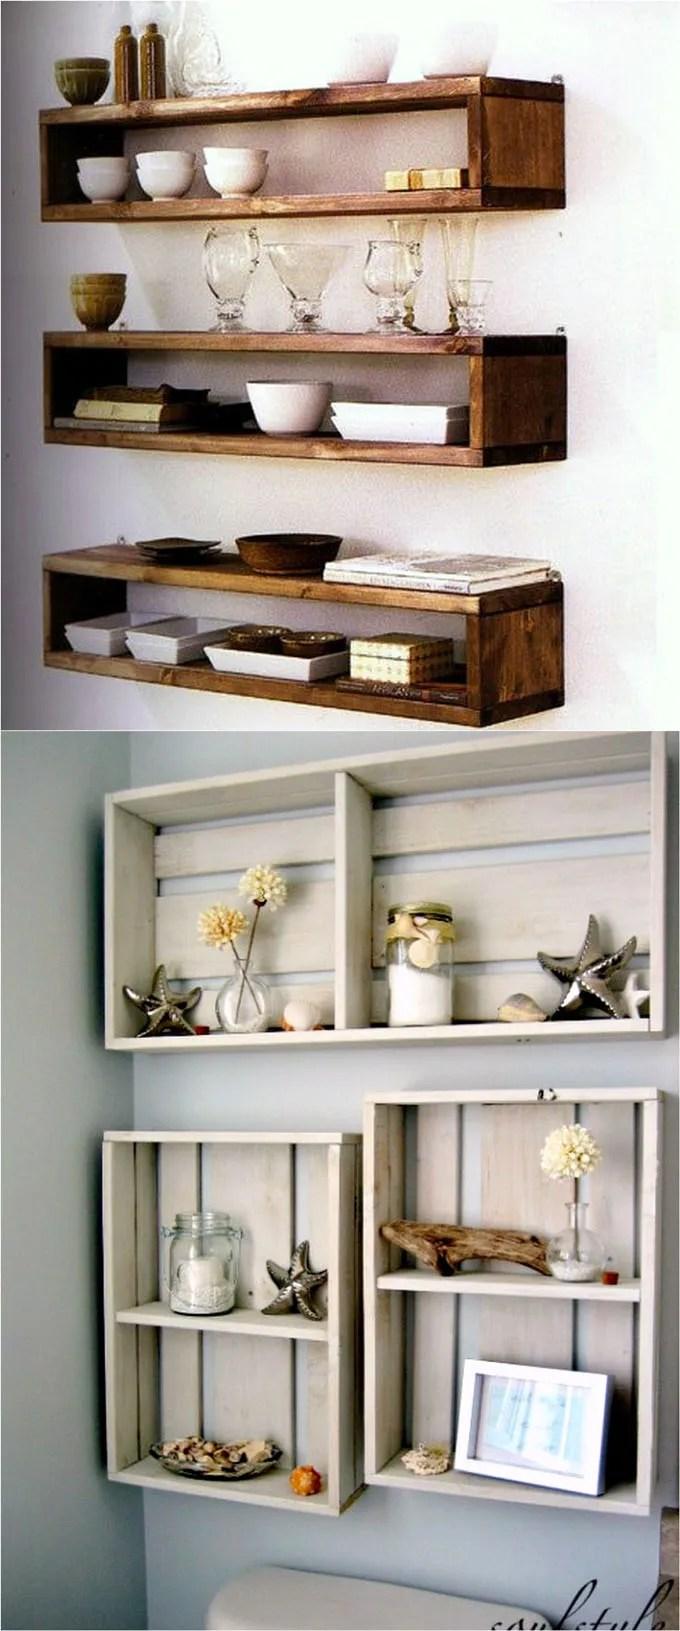 Large Of Hanging Shelves Ideas